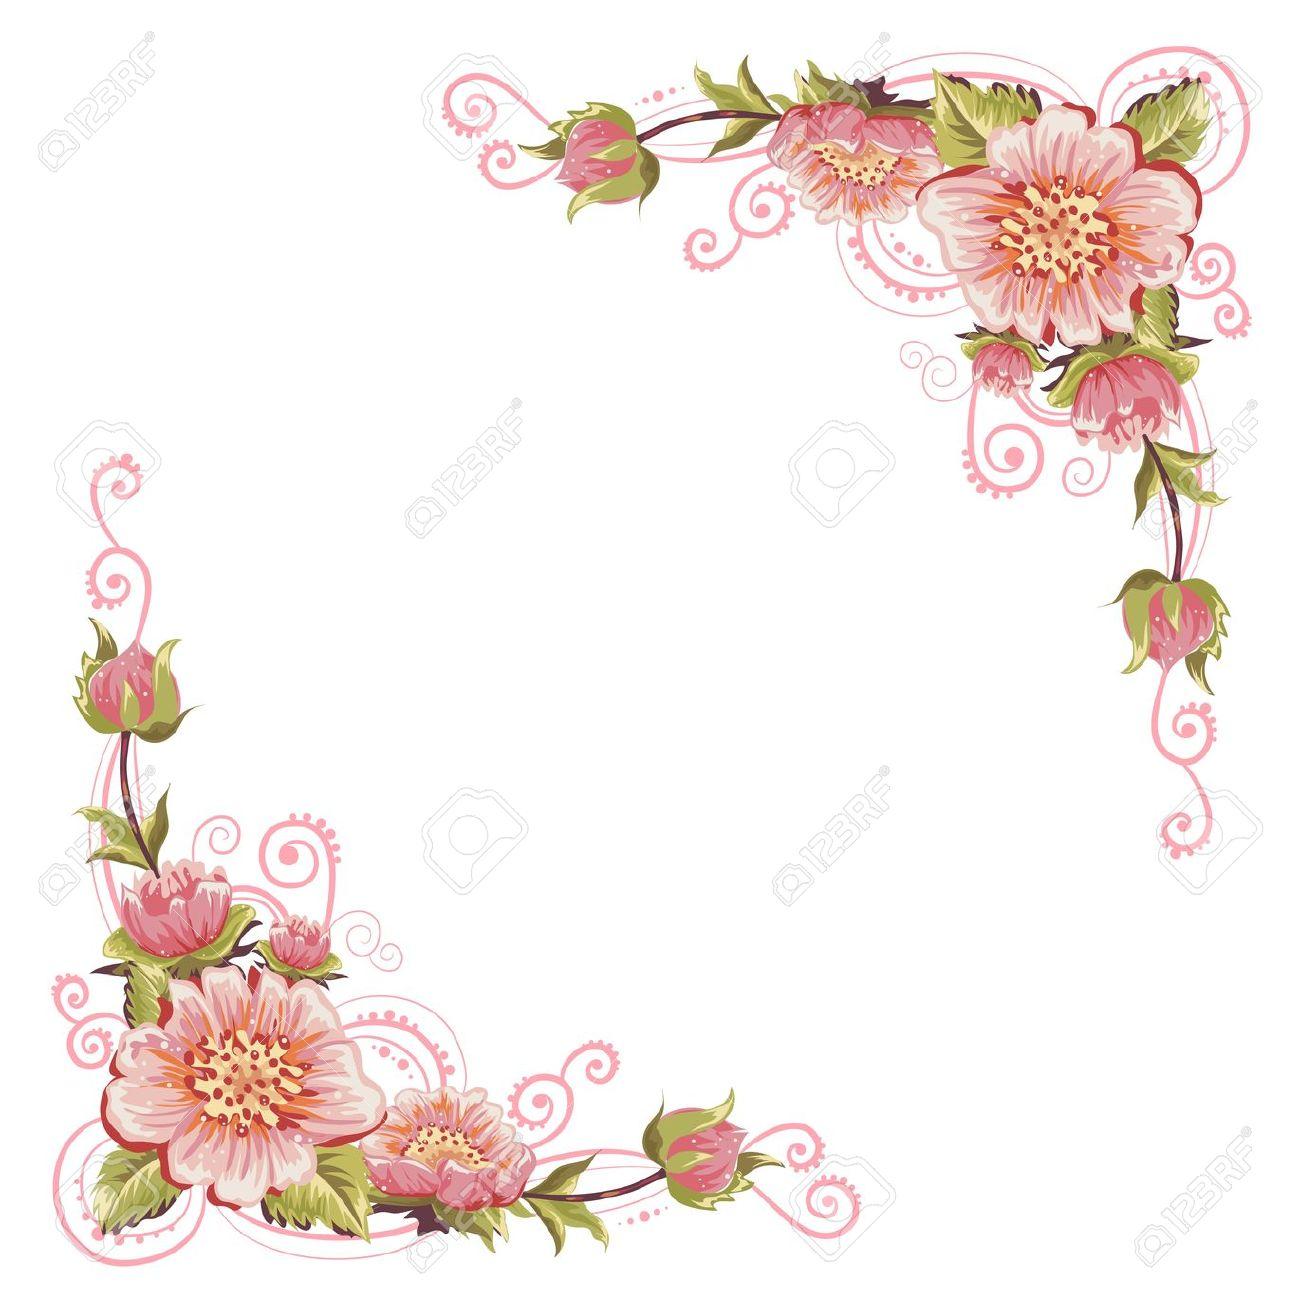 Floral clipart elegant flower Free Clipart Collection Purple floral